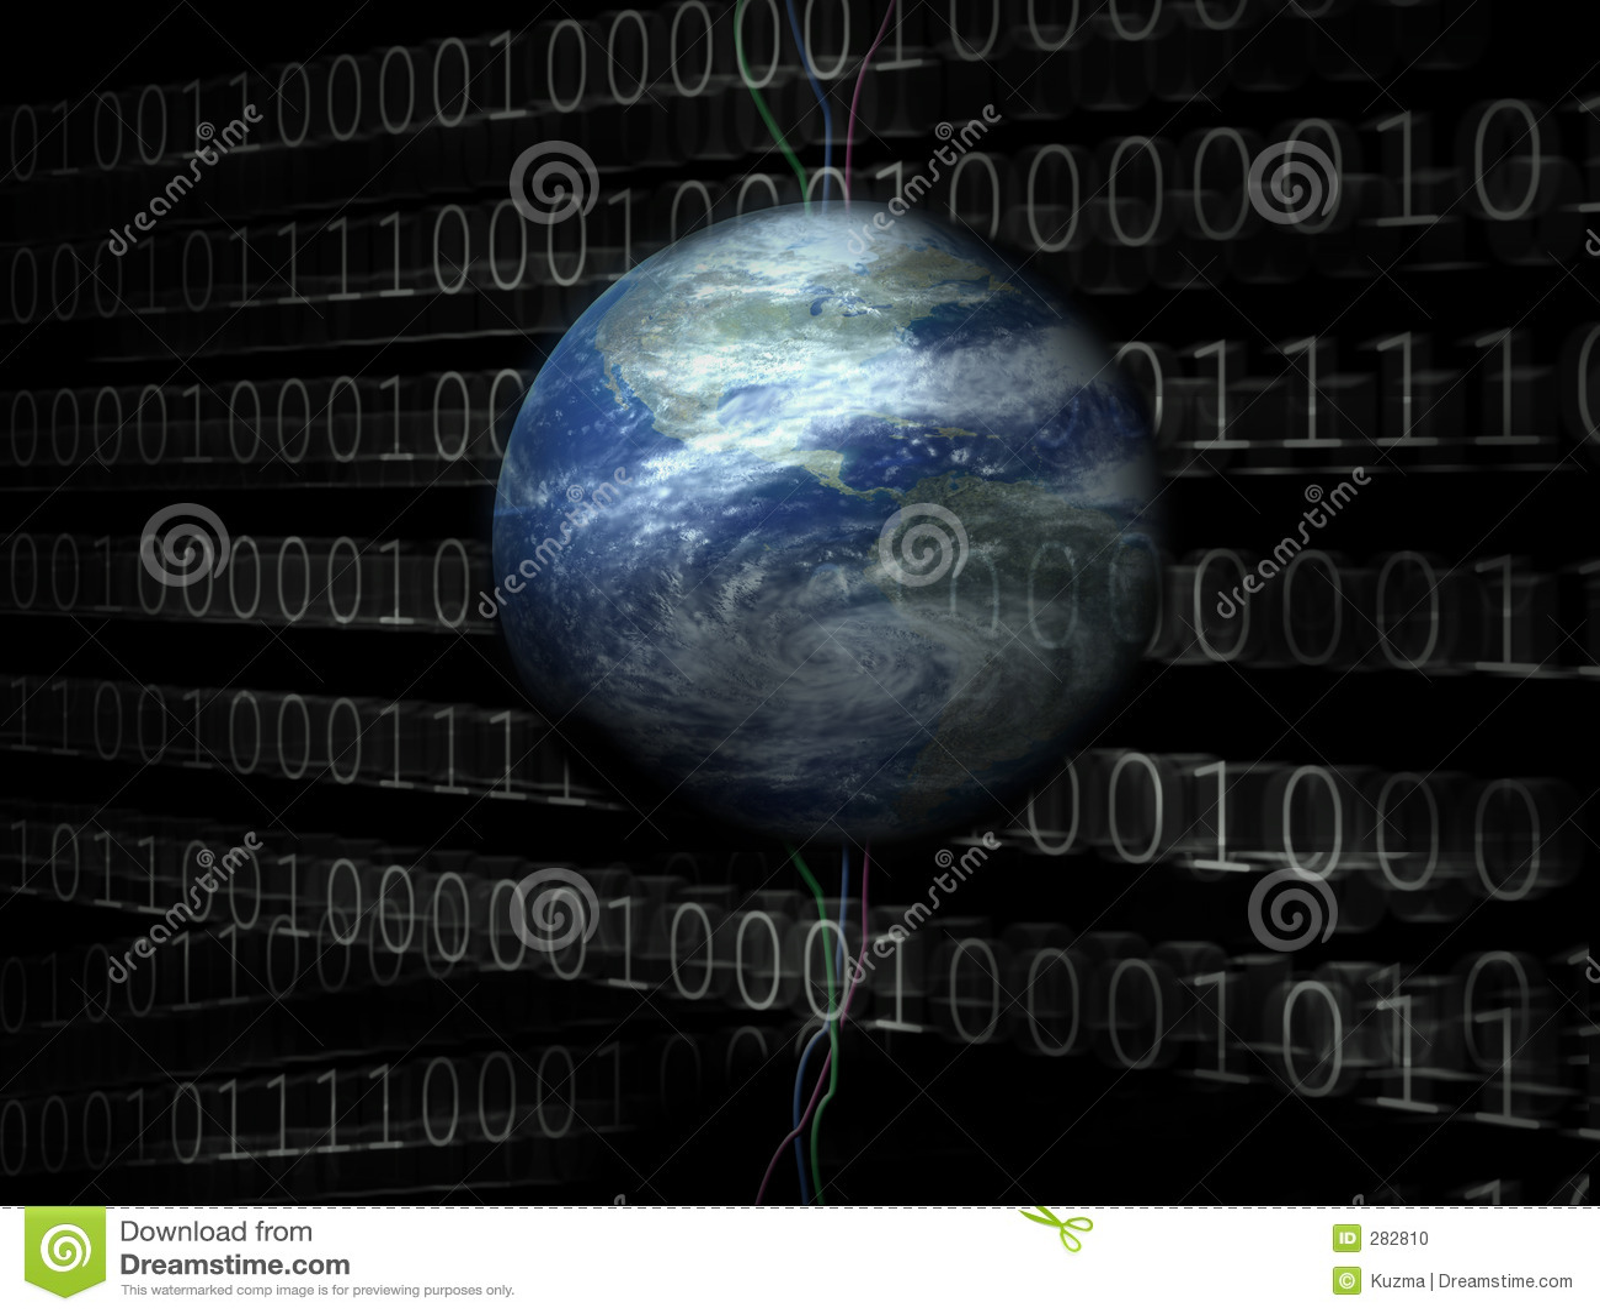 3D digitaal heelal